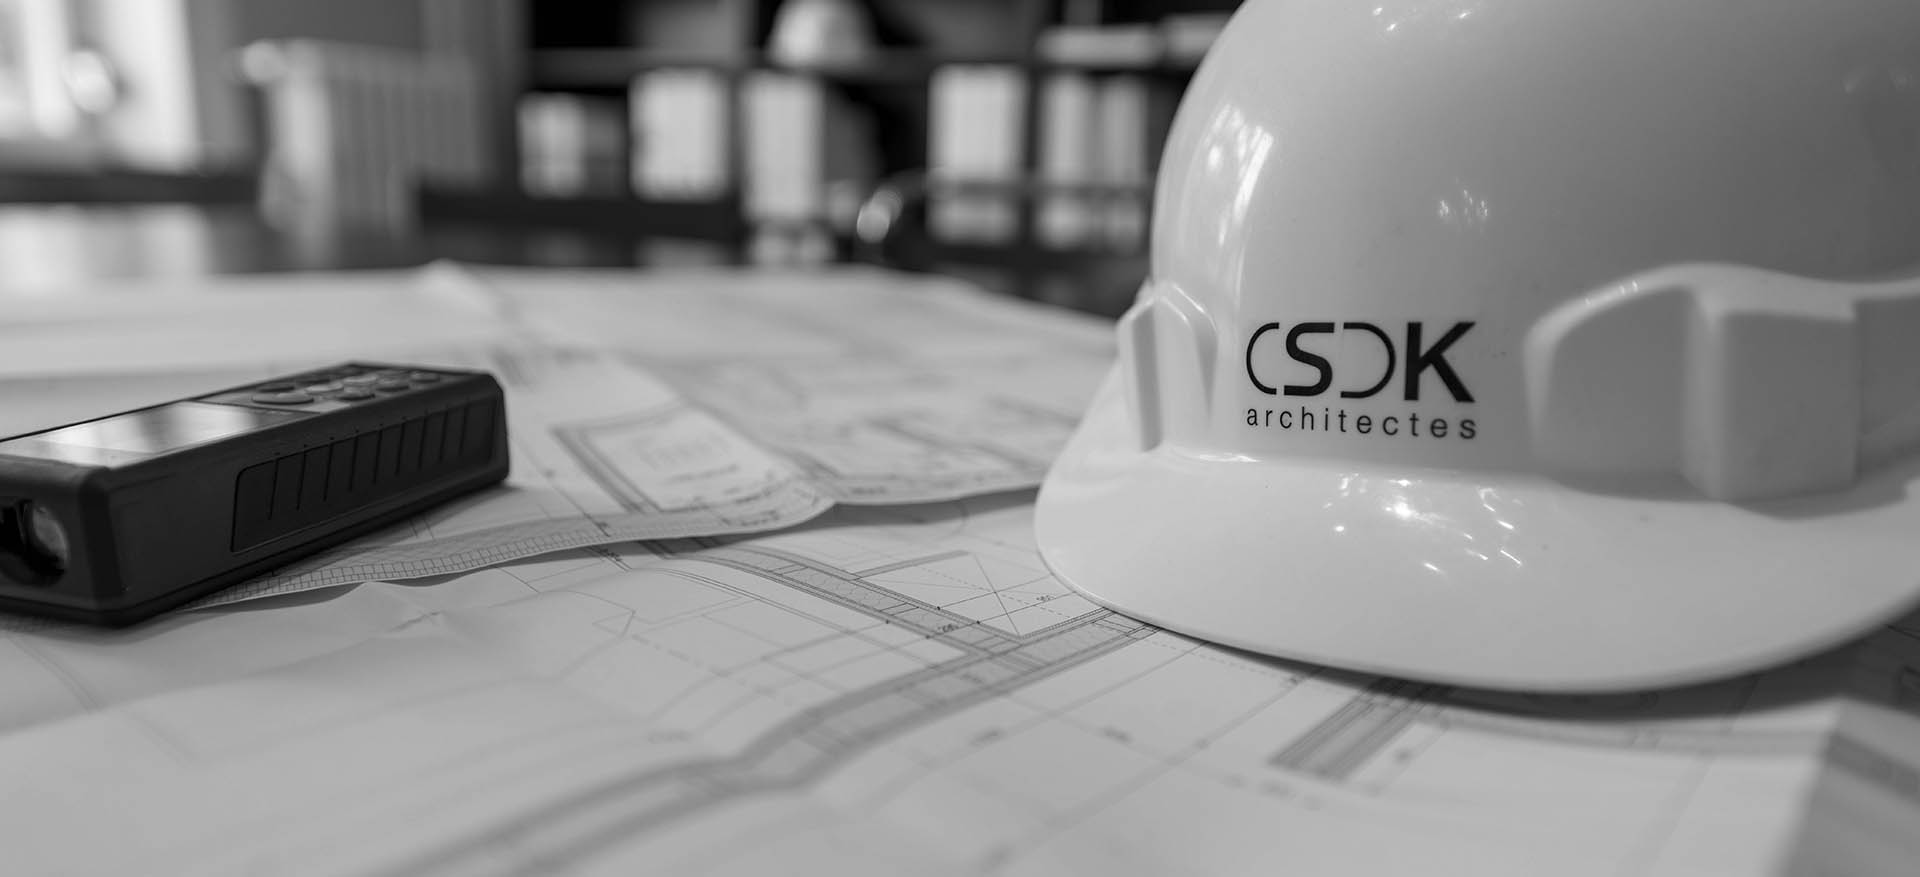 CSDK Architectes bureau darchitectes emploi - Emploi - CSDK Architectes bureau darchitectes emploi